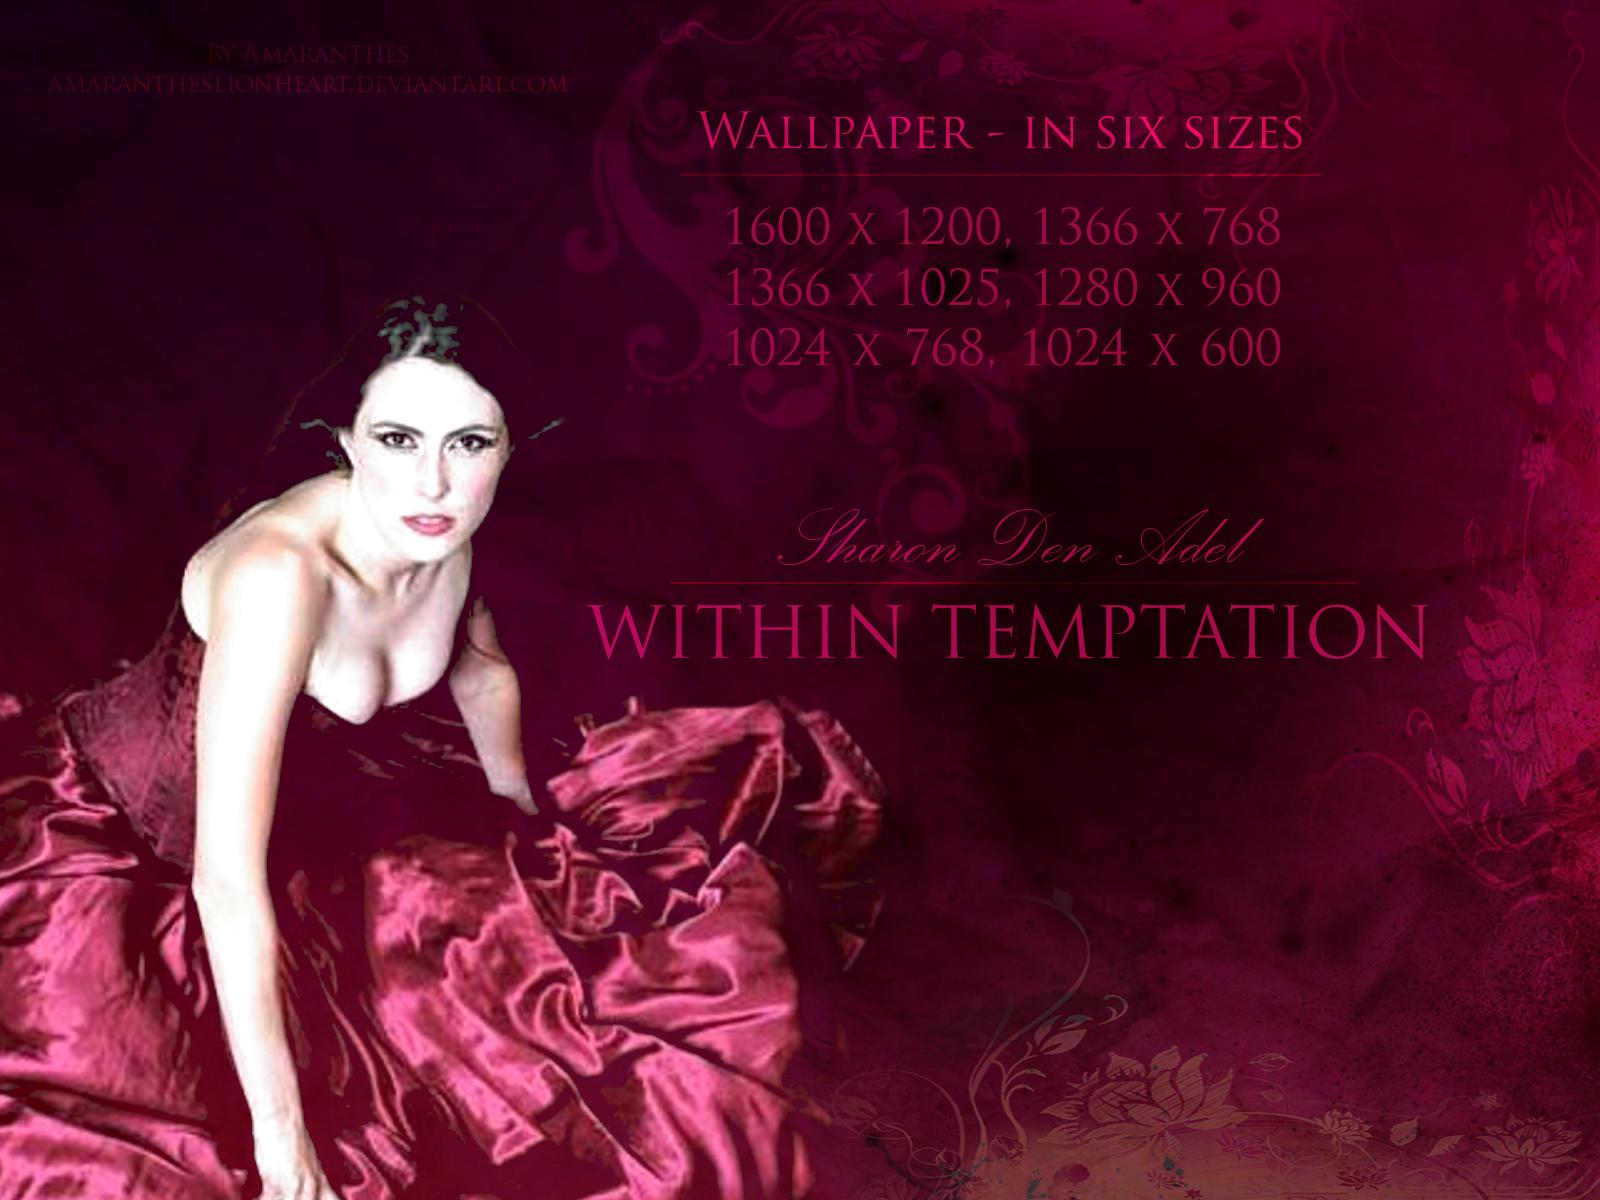 Sharon Den Adel Within Temptation Wallpaper By